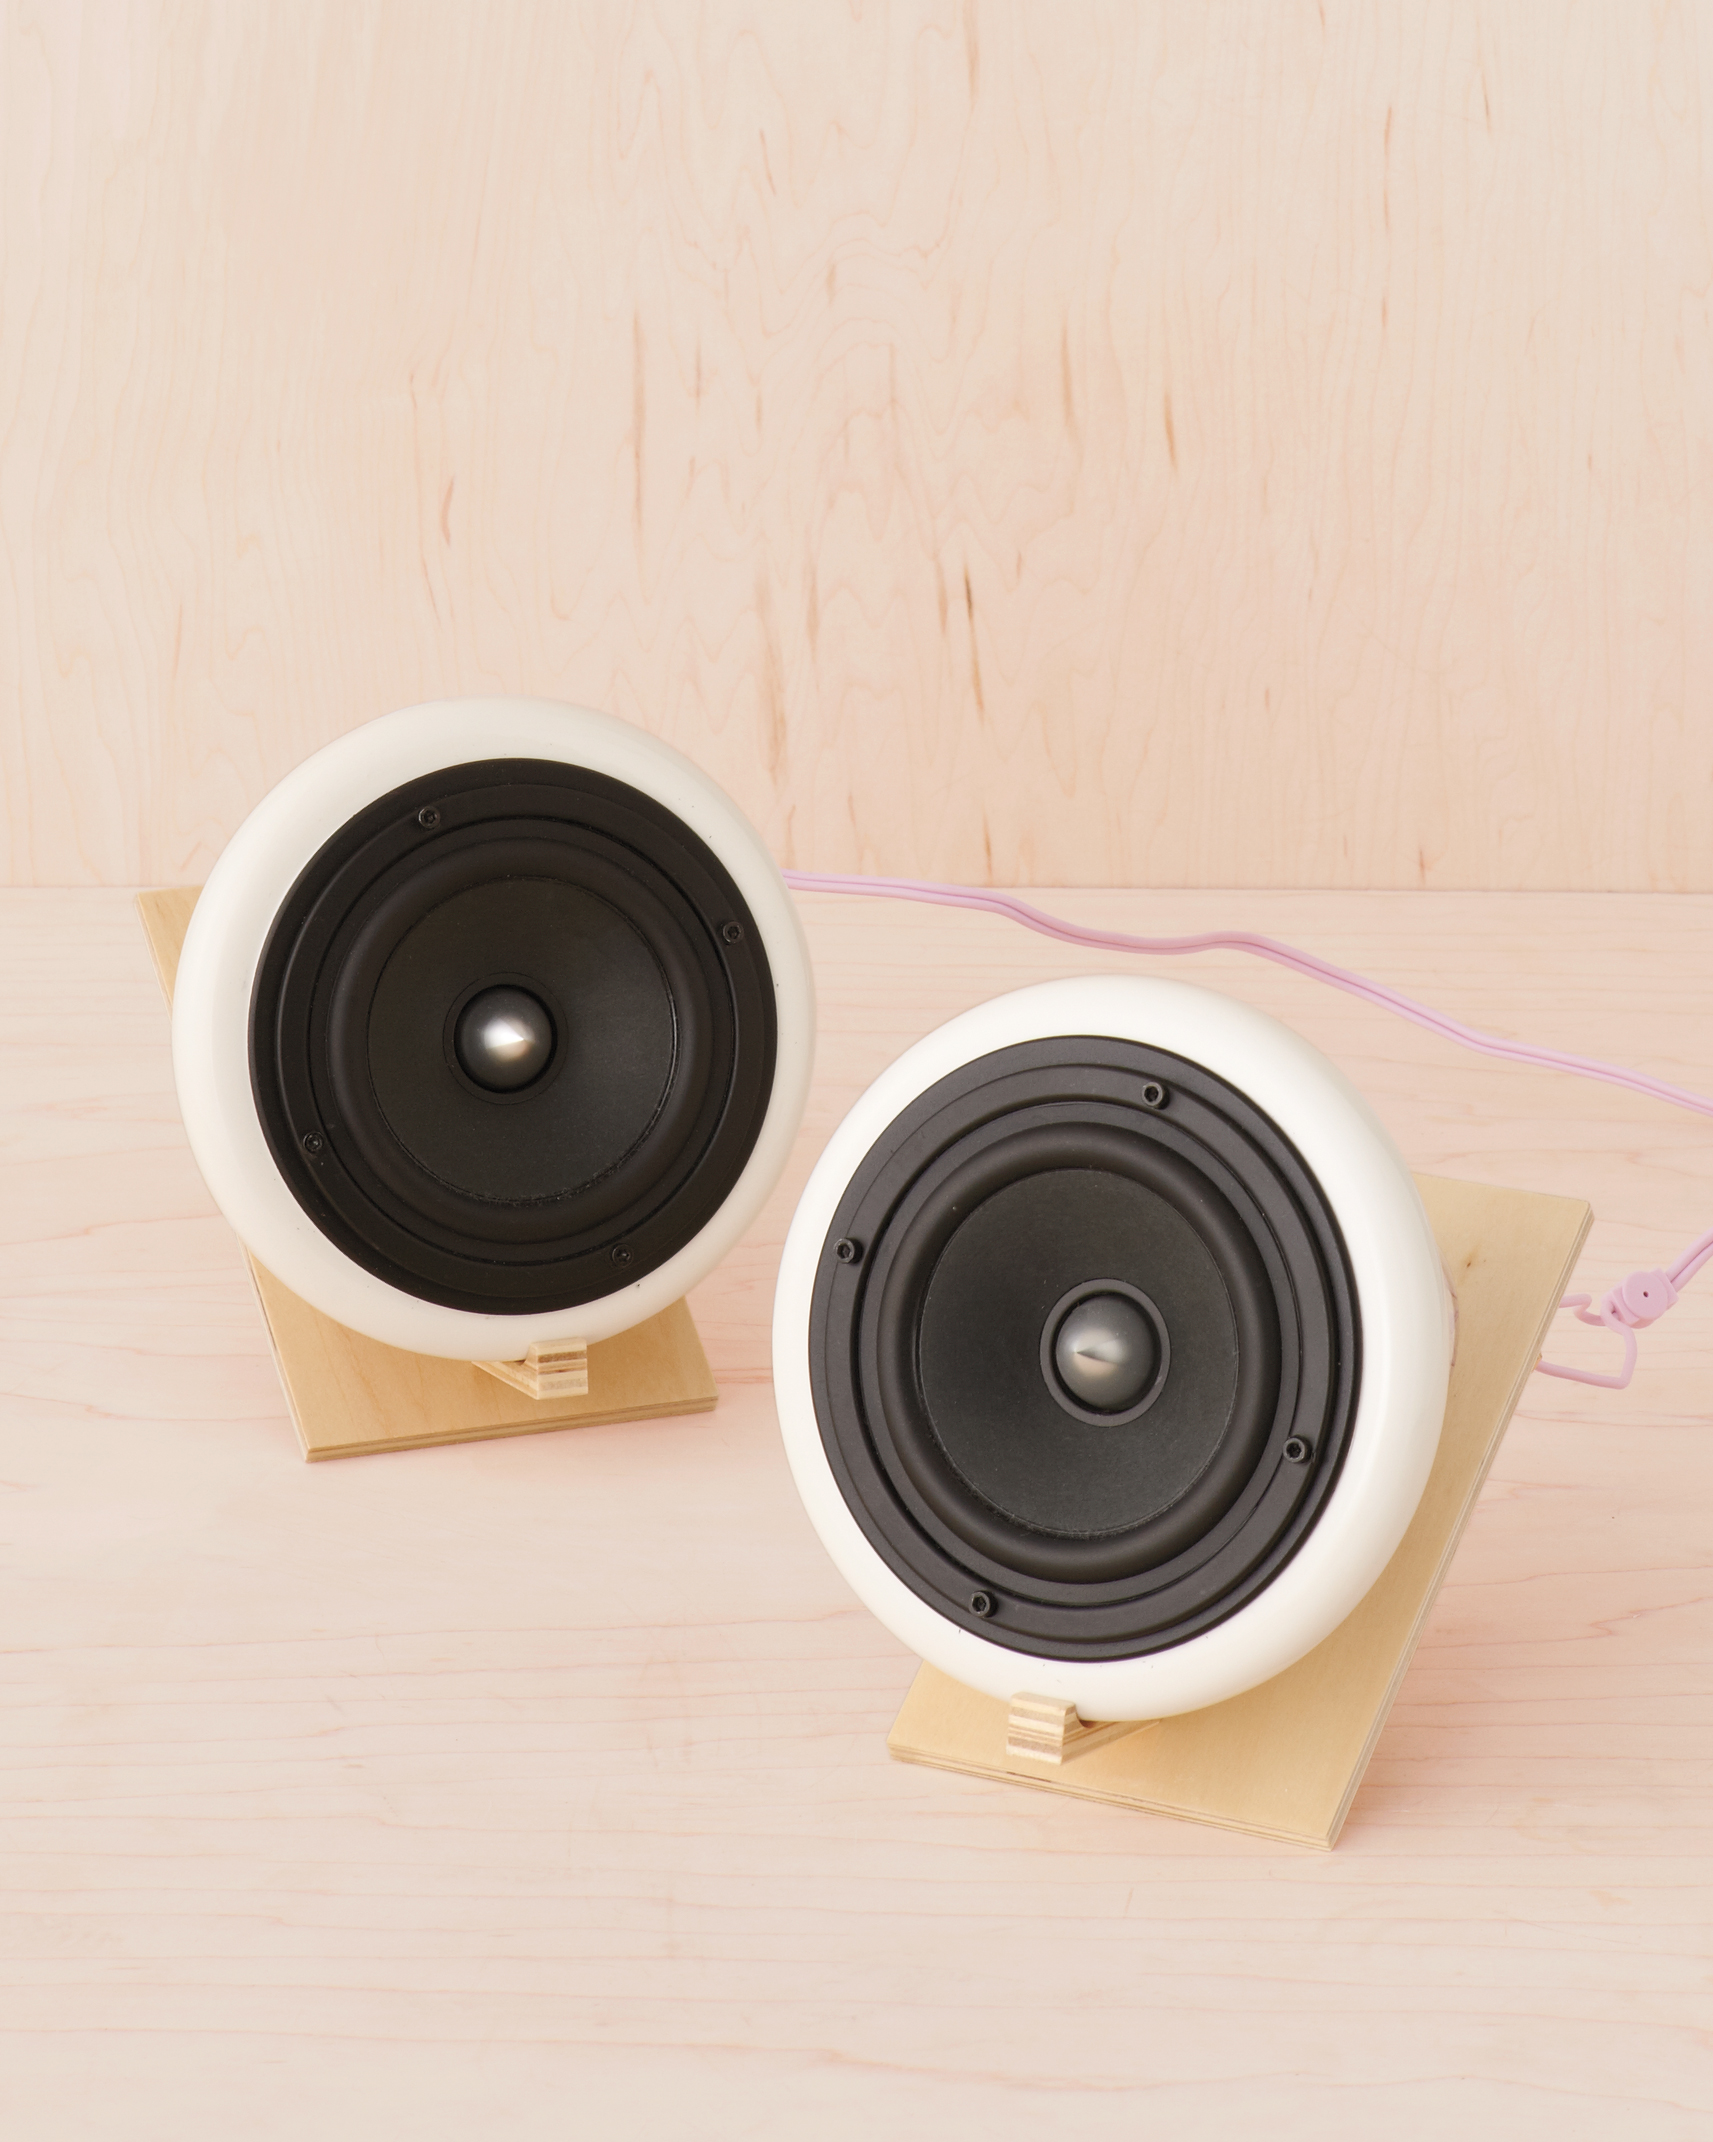 waffle-maker-019-mwd109796.jpg